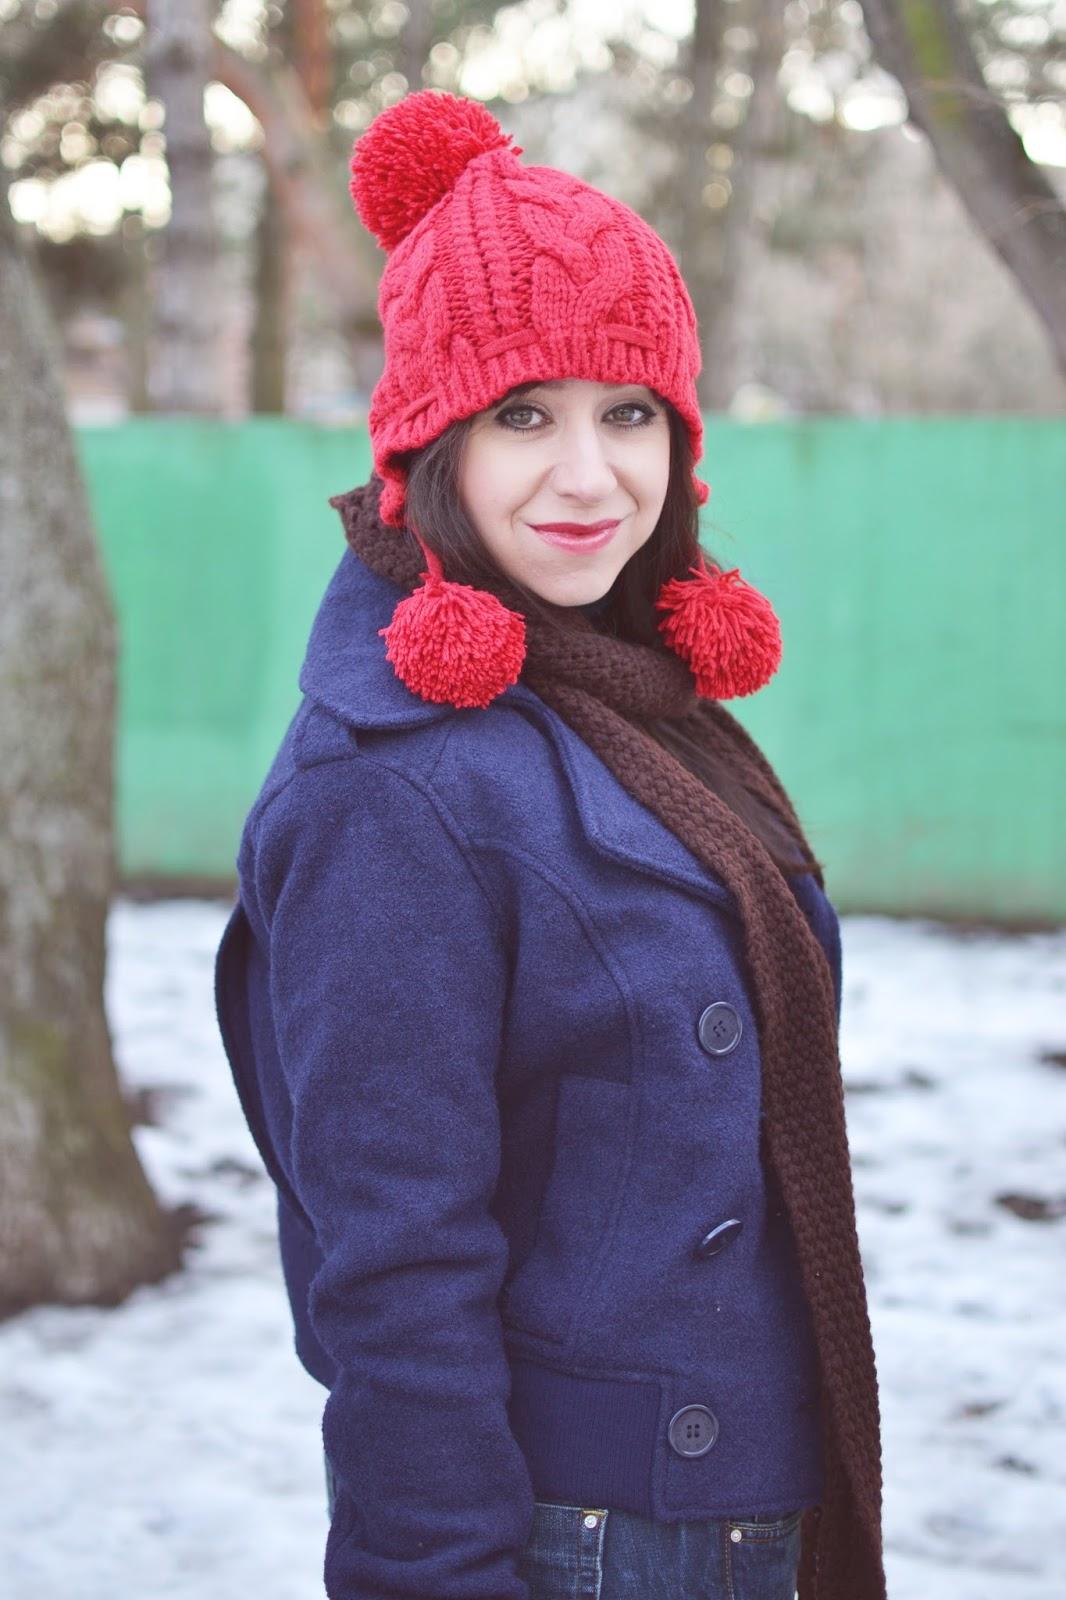 Spontánne versus plánovane_Katharine-fashion is beautiful_Červená čiapka_Roztrhané džínsy_Červené členkové čižmy_Katarína Jakubčová_fashion blogger